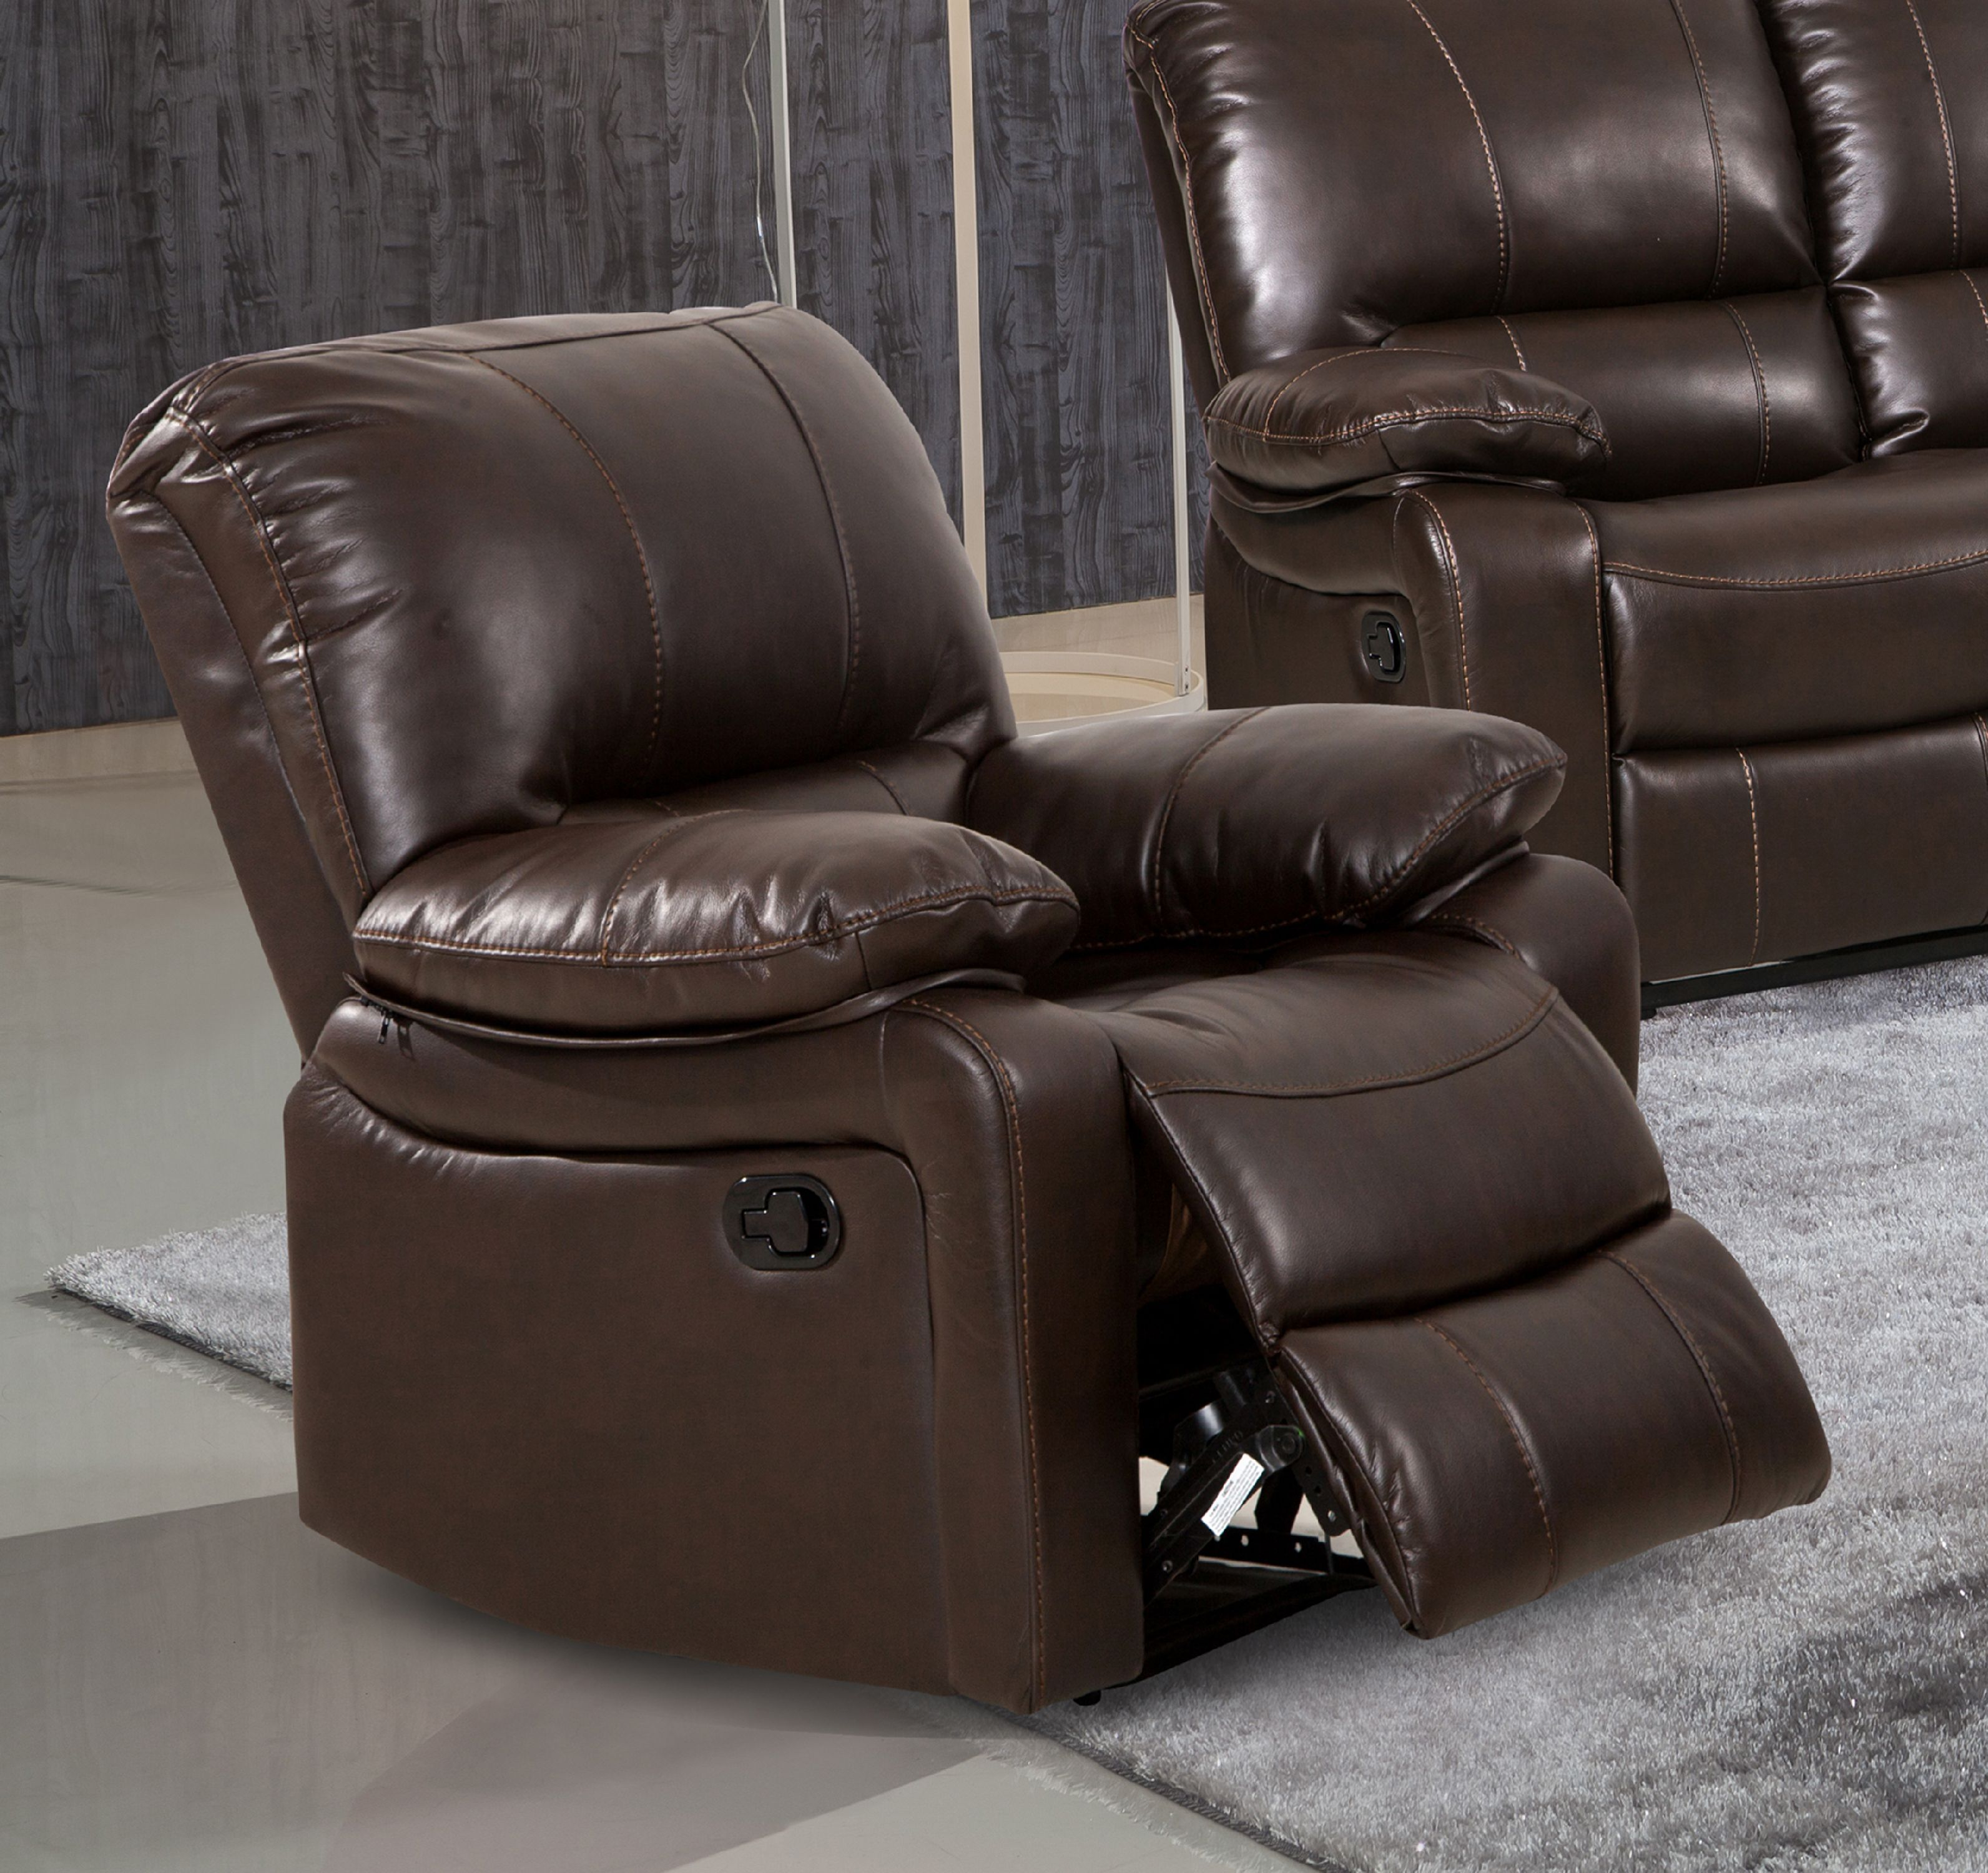 Dark Brown Leather Recliner Chair evelyn dark brown leather gel reclining rocking chair - walmart